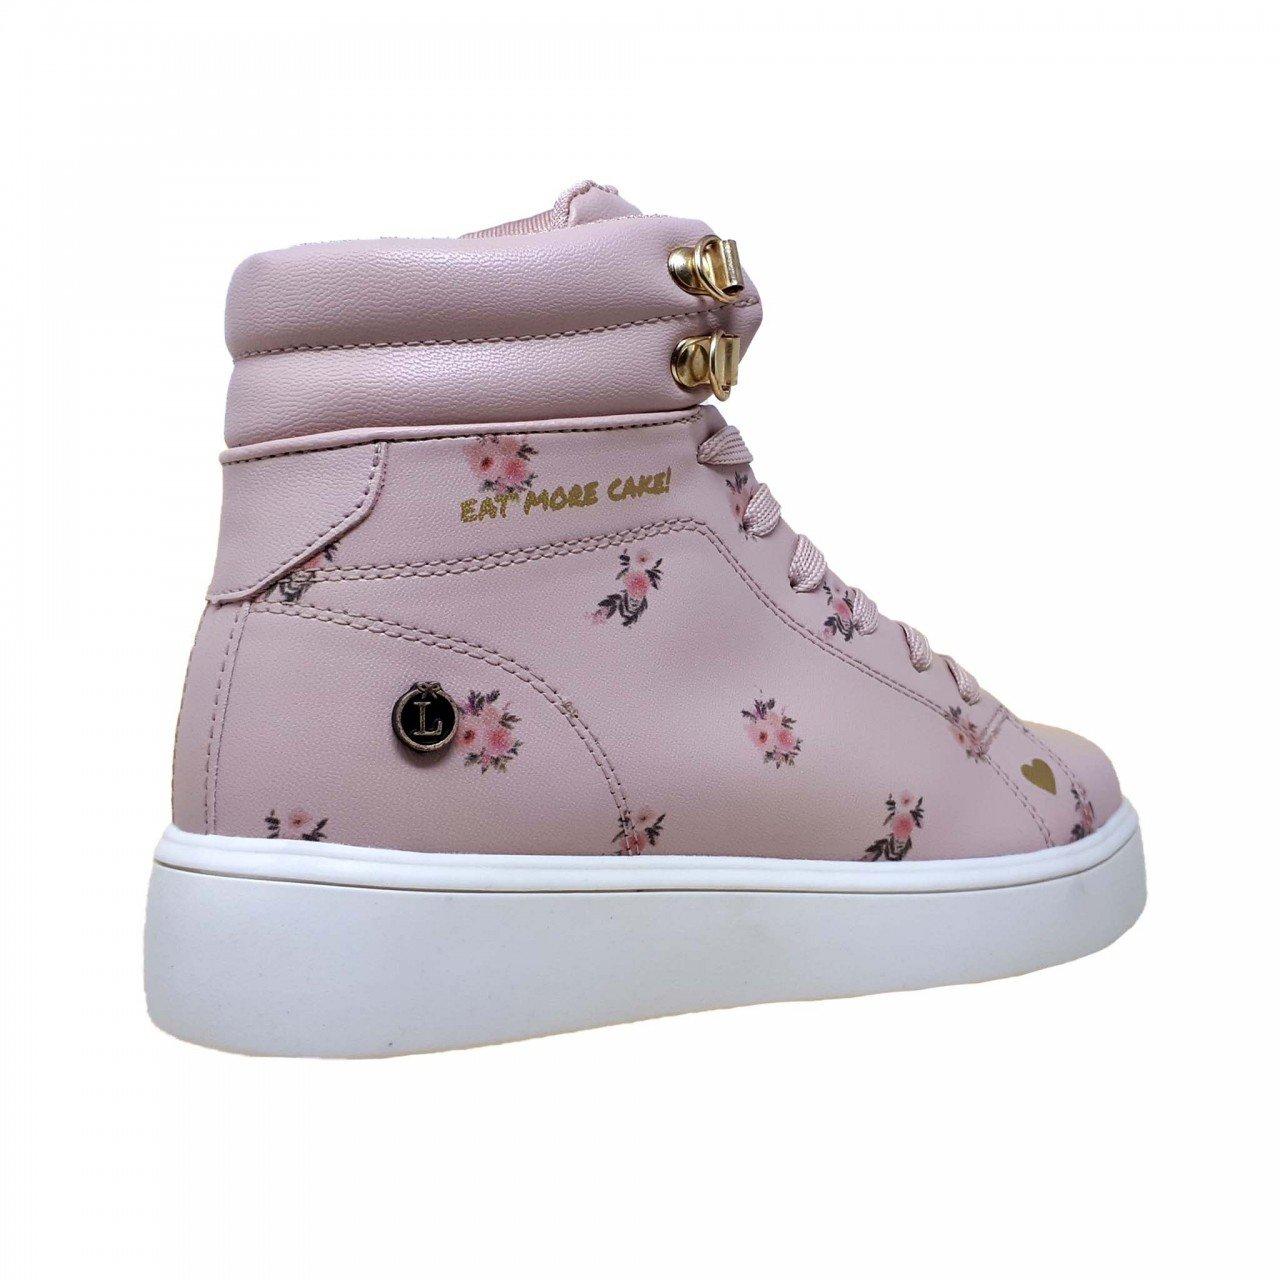 Tenis bota rosa con flores para mujer Celestine Loly in the sky